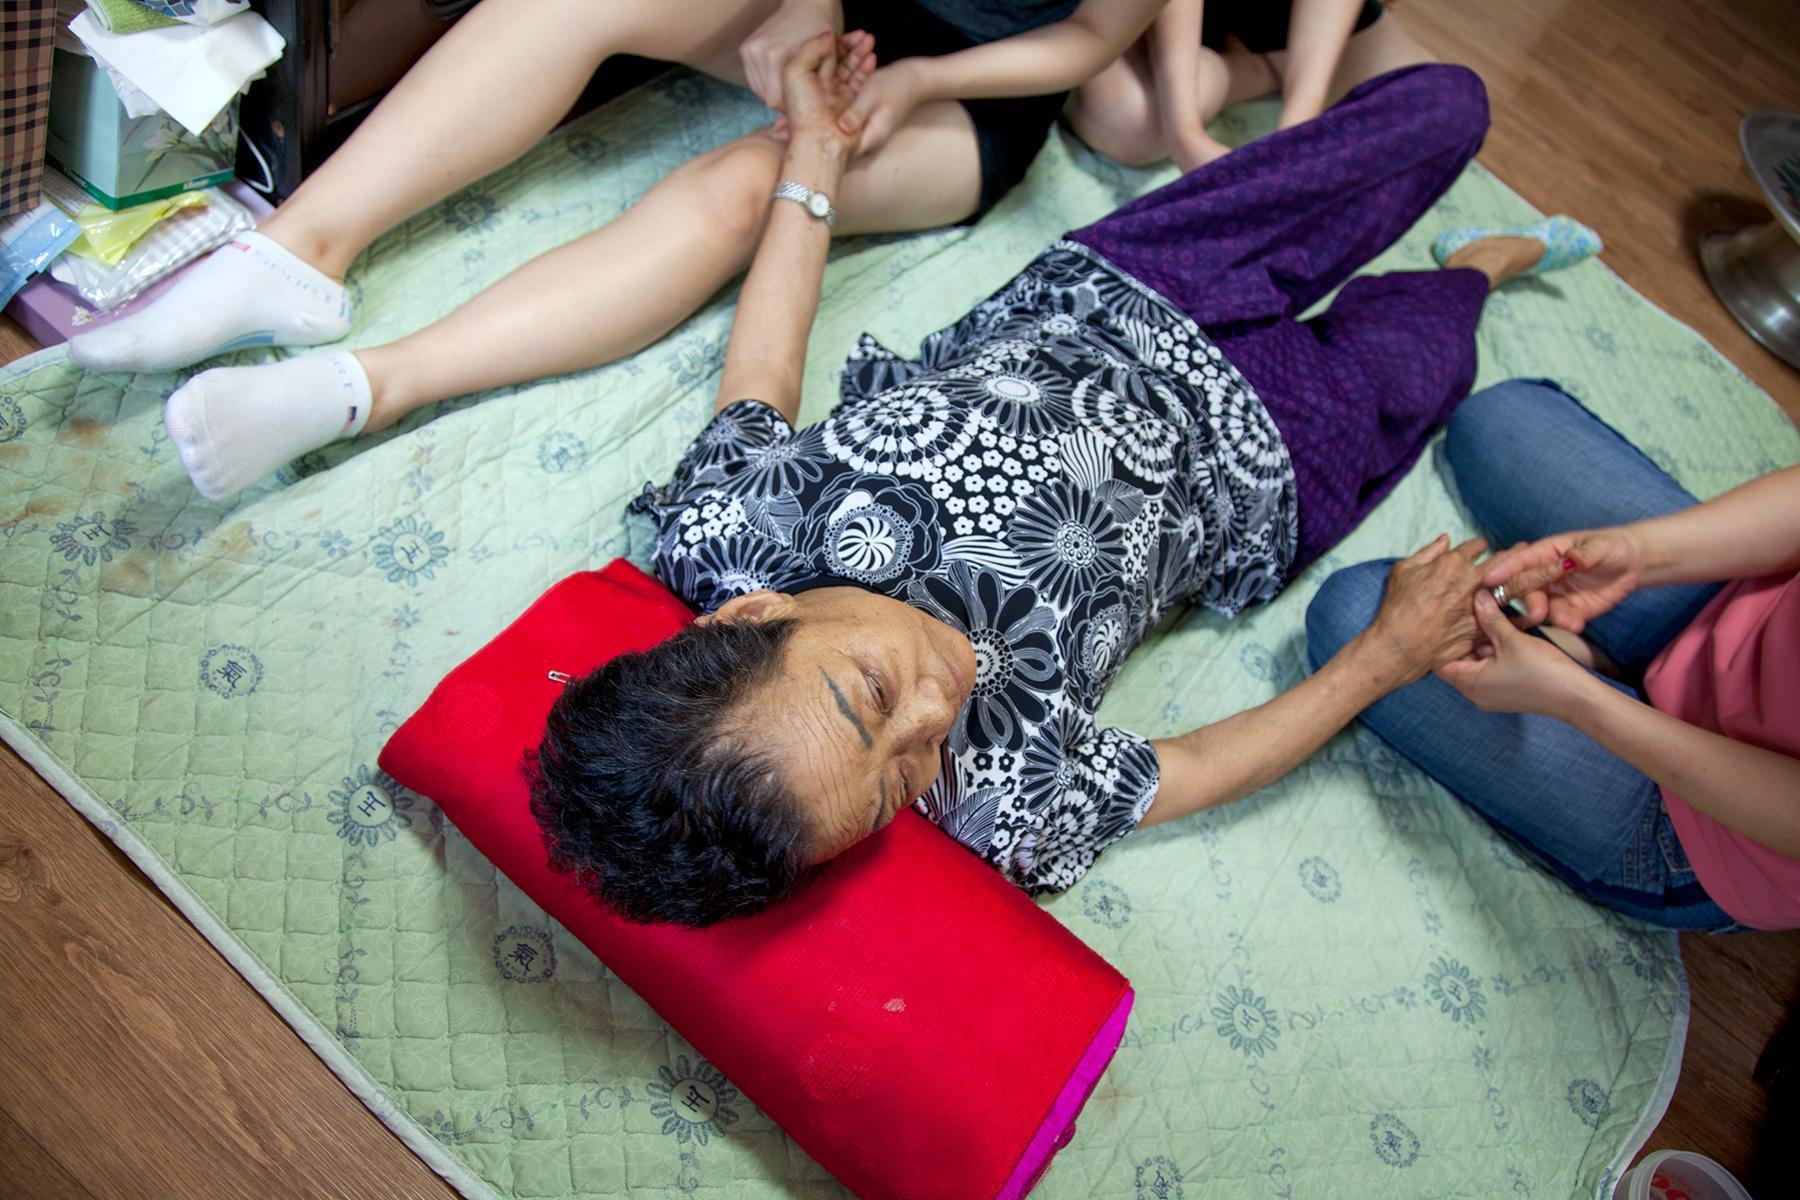 Kim Hwa Seon Halmoni with visitors, House of Sharing, Gwangju, South Korea, 2010